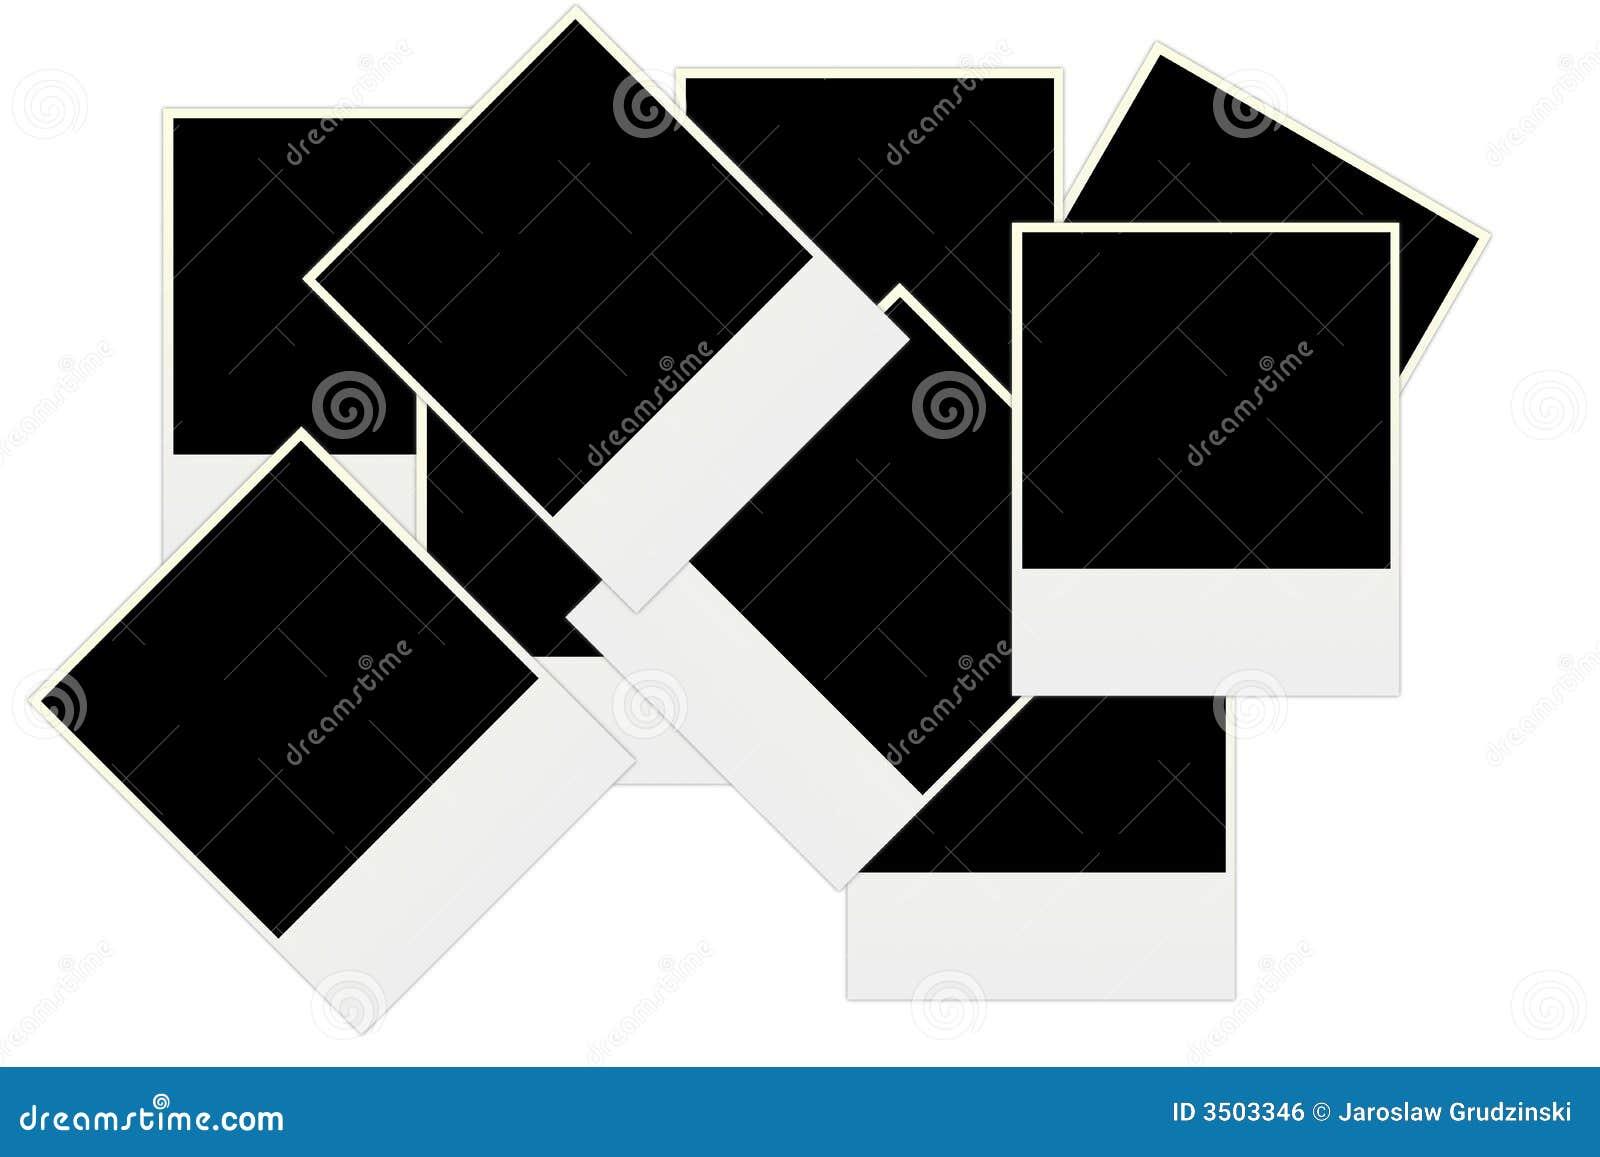 Blank fotopolaroid